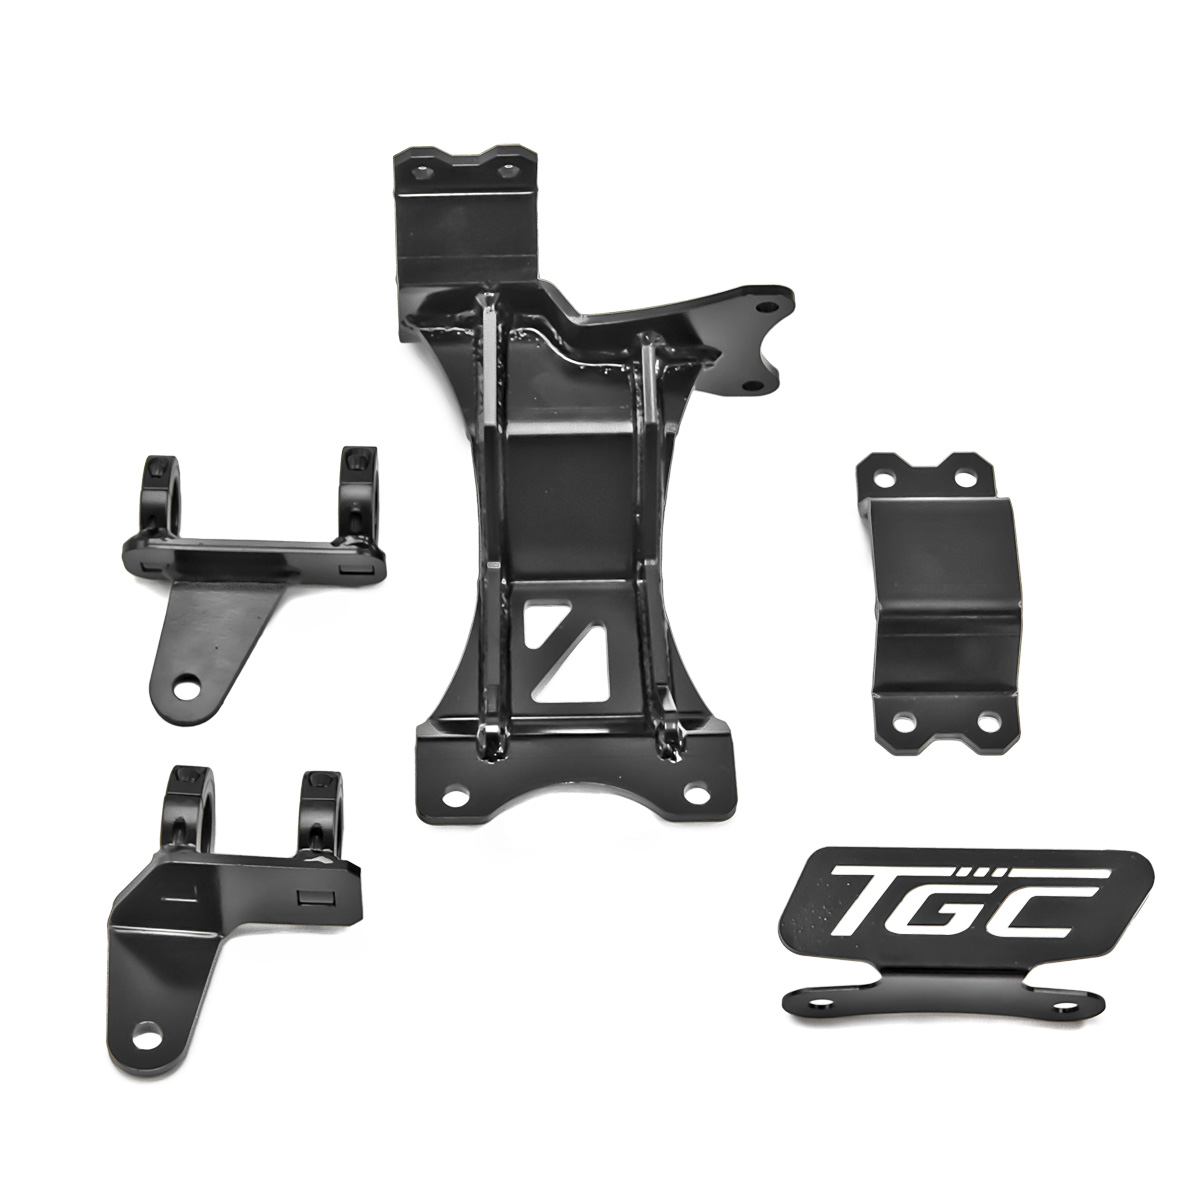 Dodge Lift Kit For 2013 Dodge Ram 3500 Truck Lift Kits